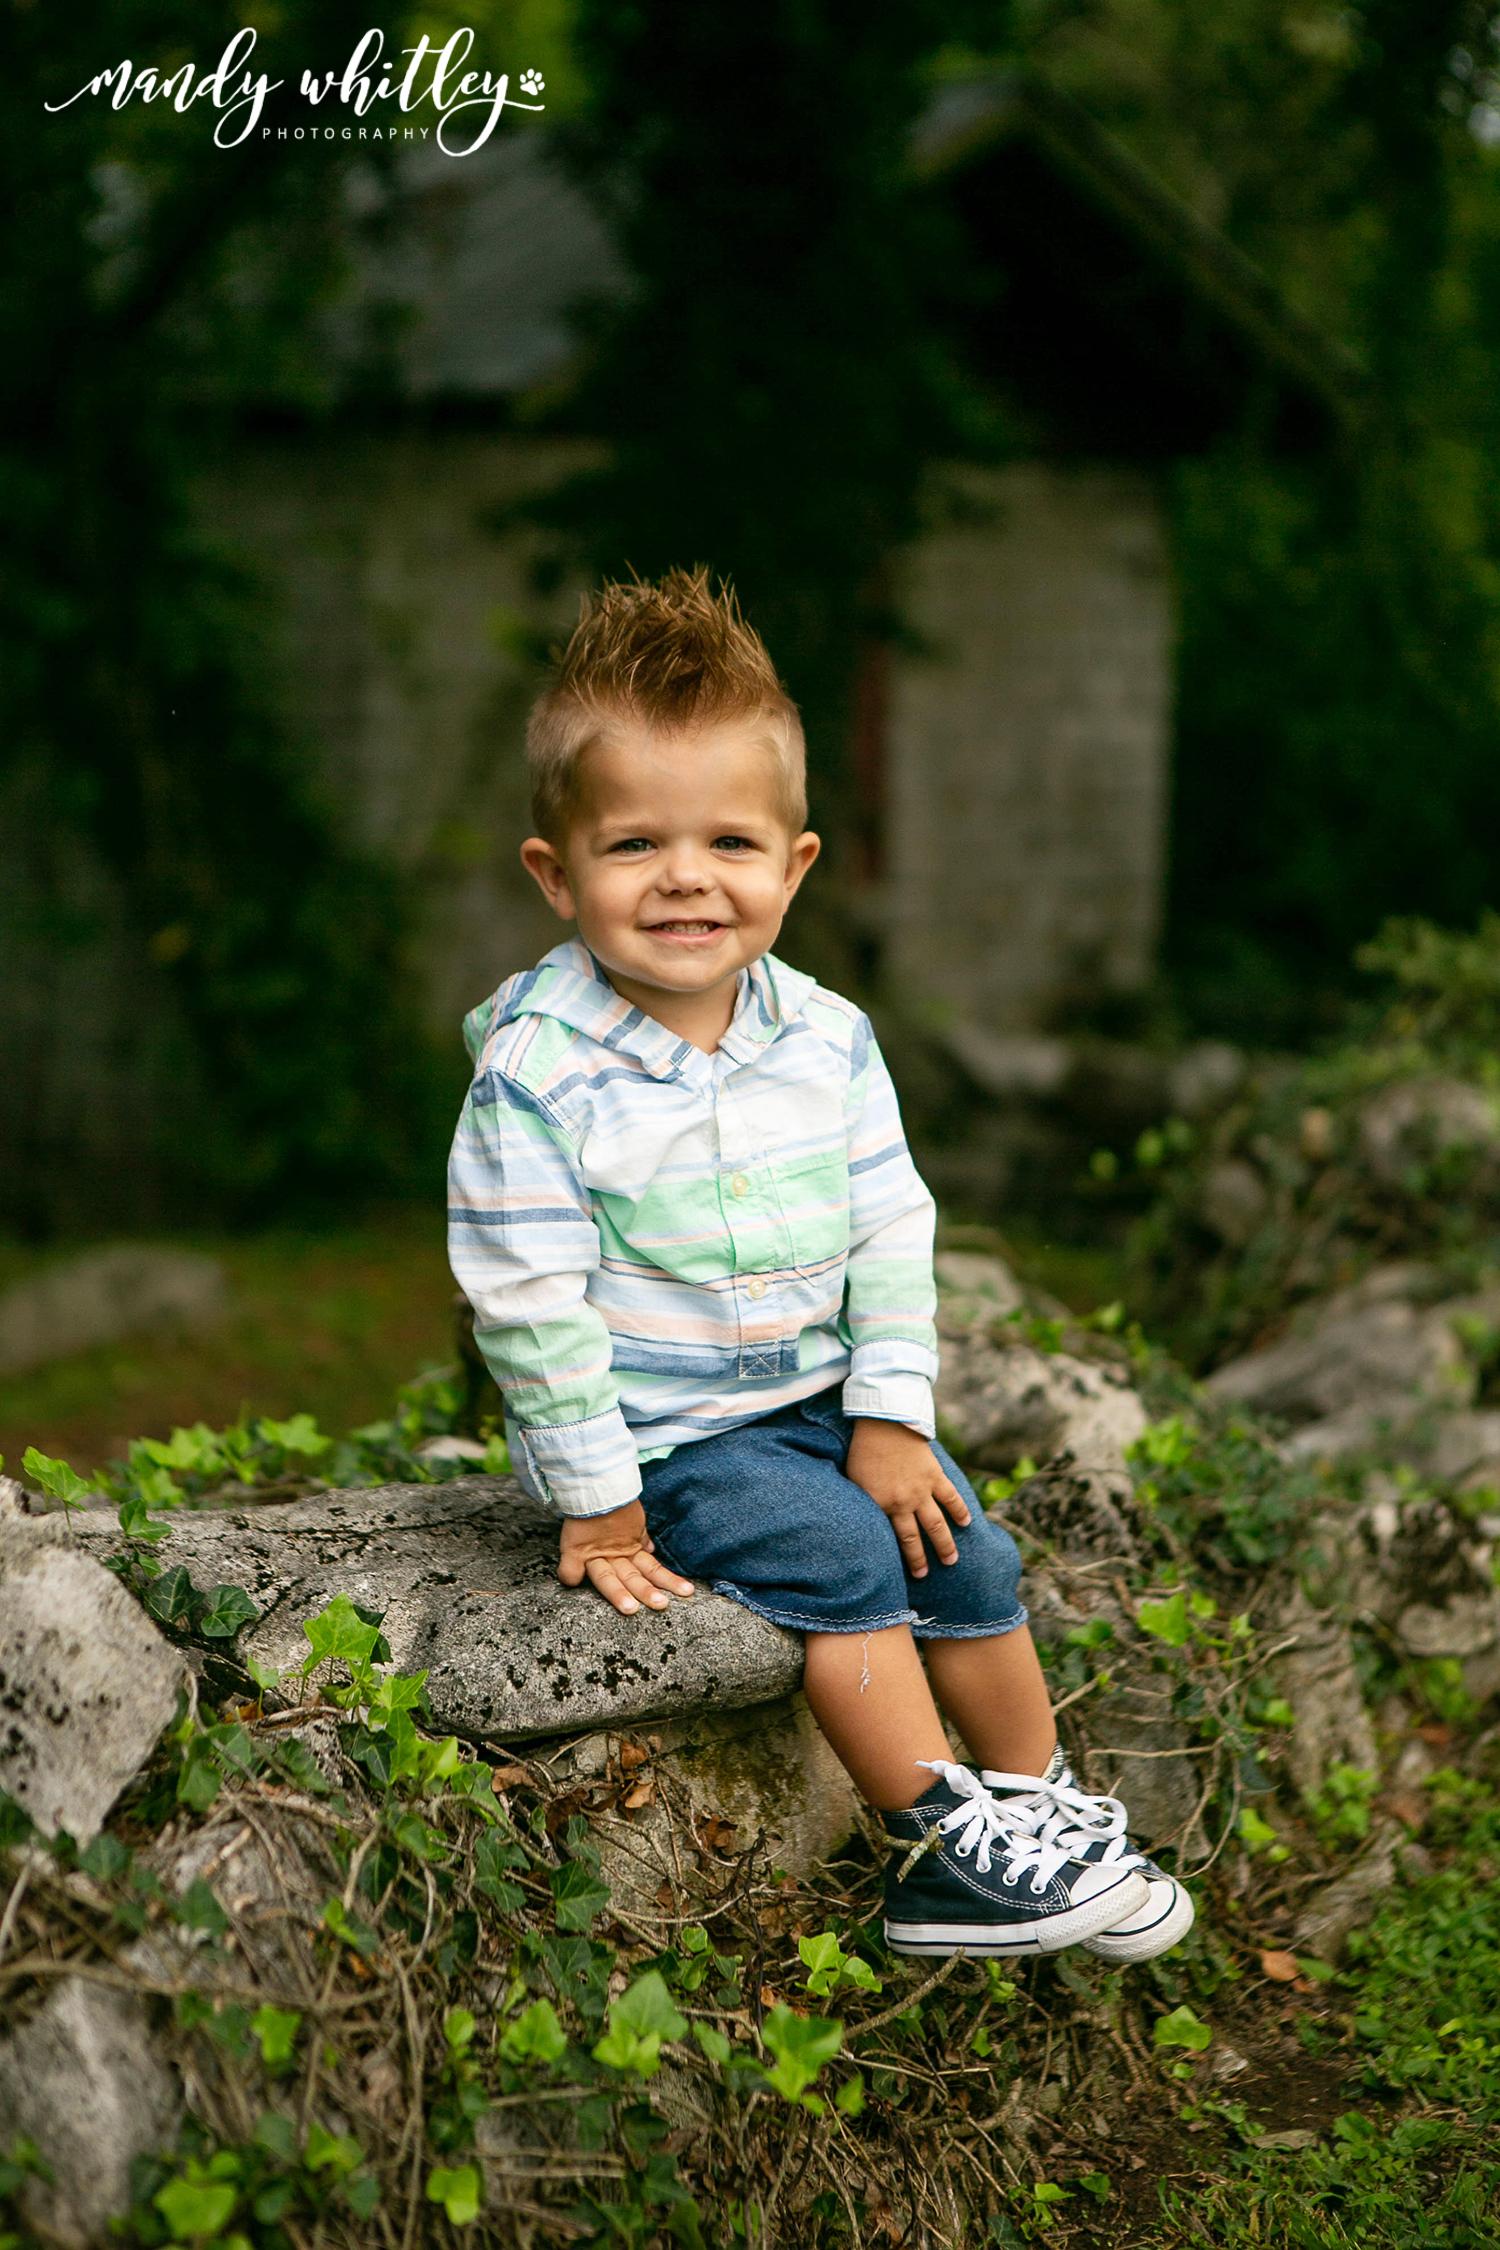 Child Photography in Nashville